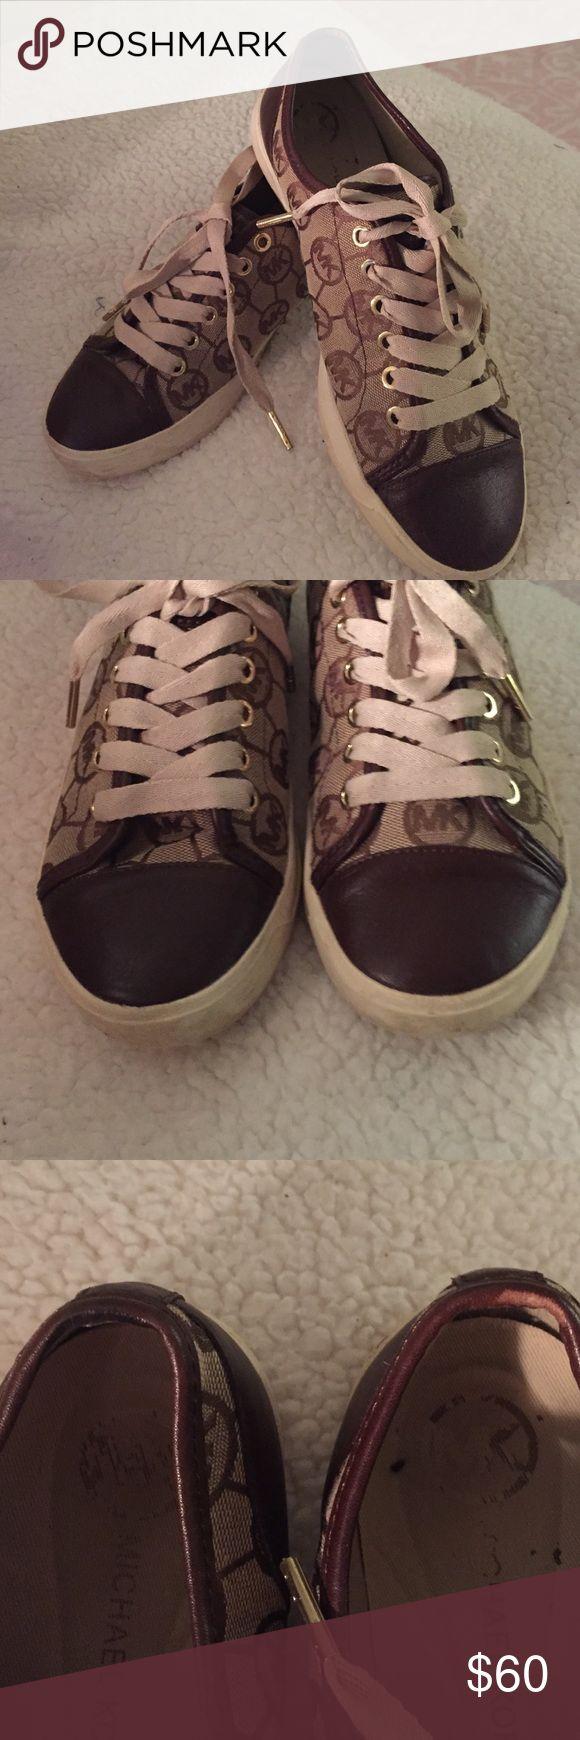 michael kors shoes velcro s across size 12 michael kors shoes sneakers. Black Bedroom Furniture Sets. Home Design Ideas